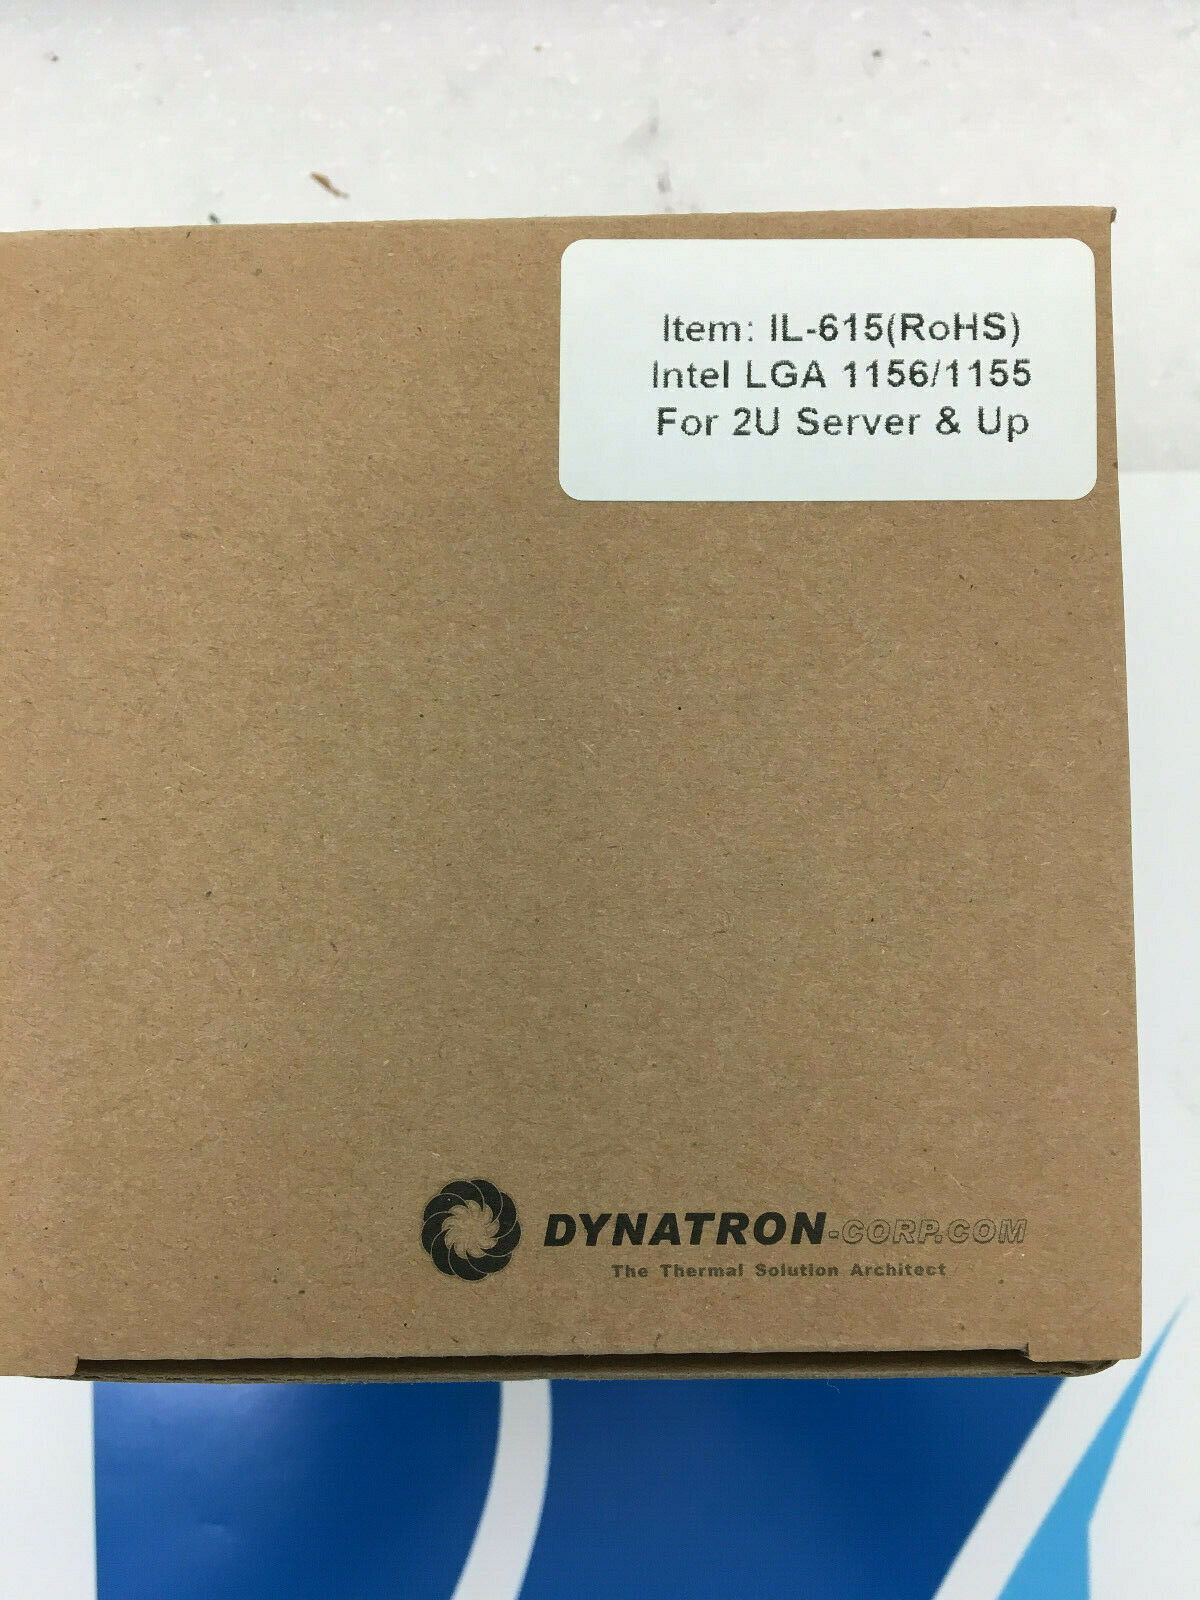 Dynatron K785 77mm 2 Ball CPU Cooler for Intel LGA Socket 1156/1155